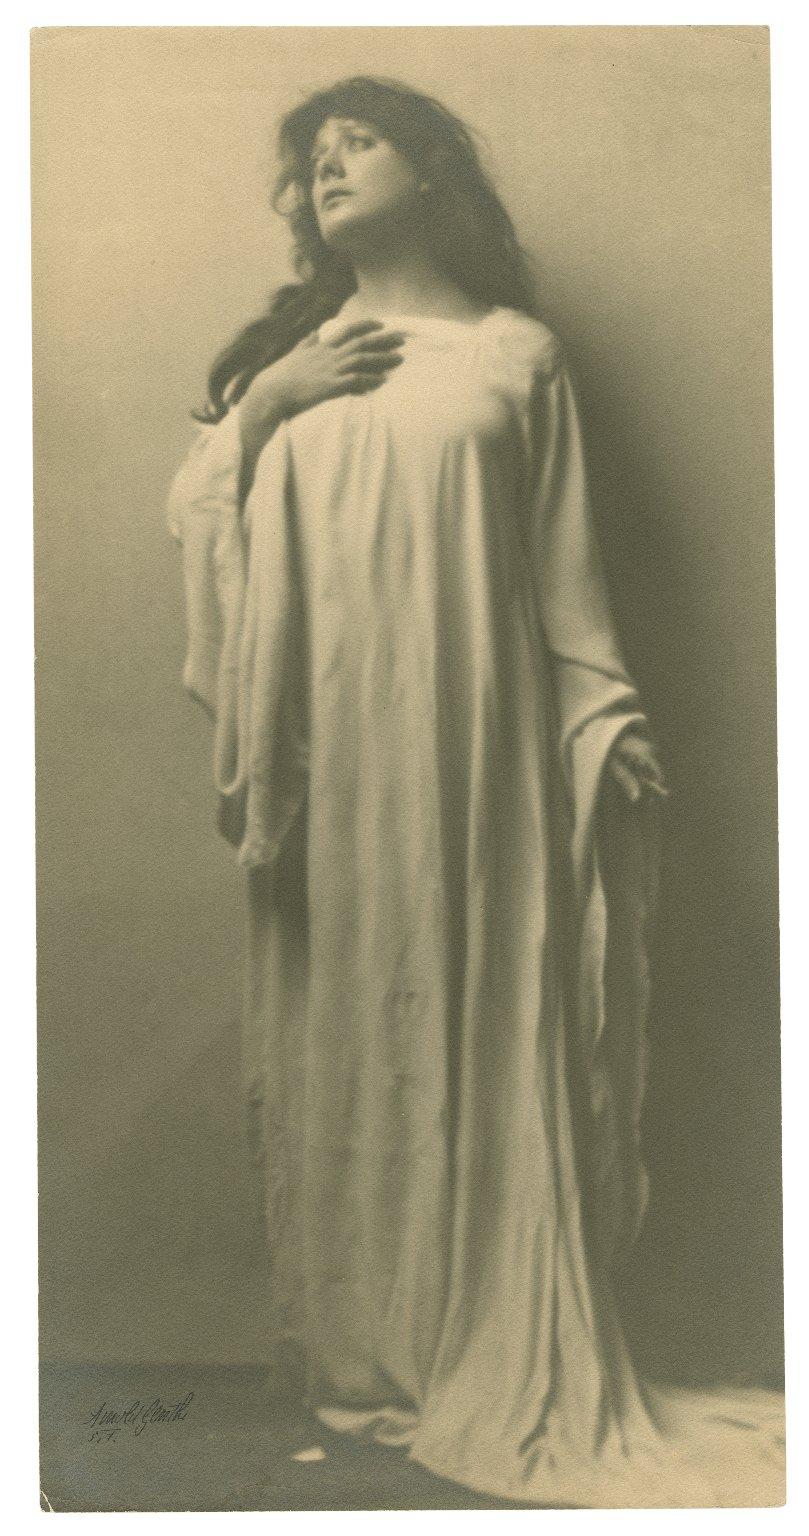 [Julia Marlowe as Lady Macbeth in Shakespeare's Macbeth] [graphic] / Arnold Genthe.